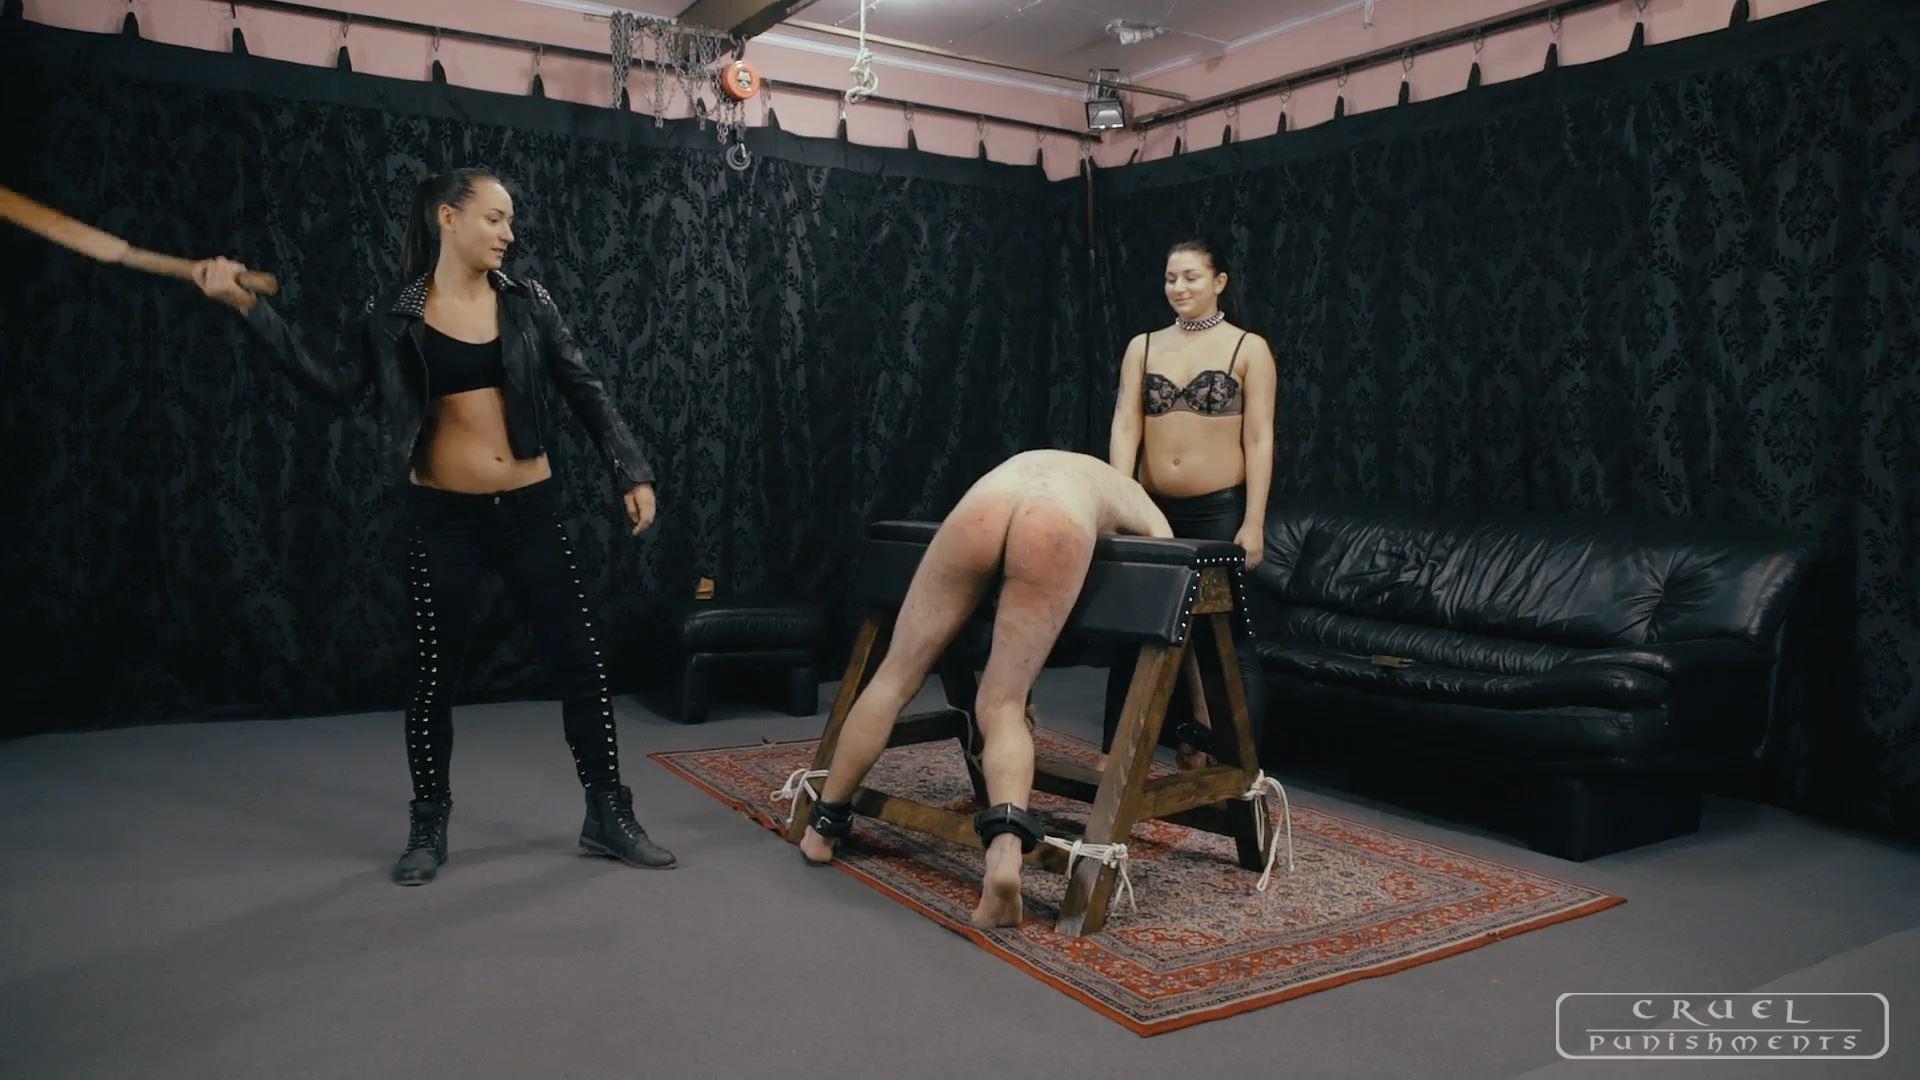 Mistress Darkness In Scene: SPANKED BY GIRLFRIENDS - CRUEL PUNISHMENTS - SEVERE FEMDOM - FULL HD/1080p/MP4